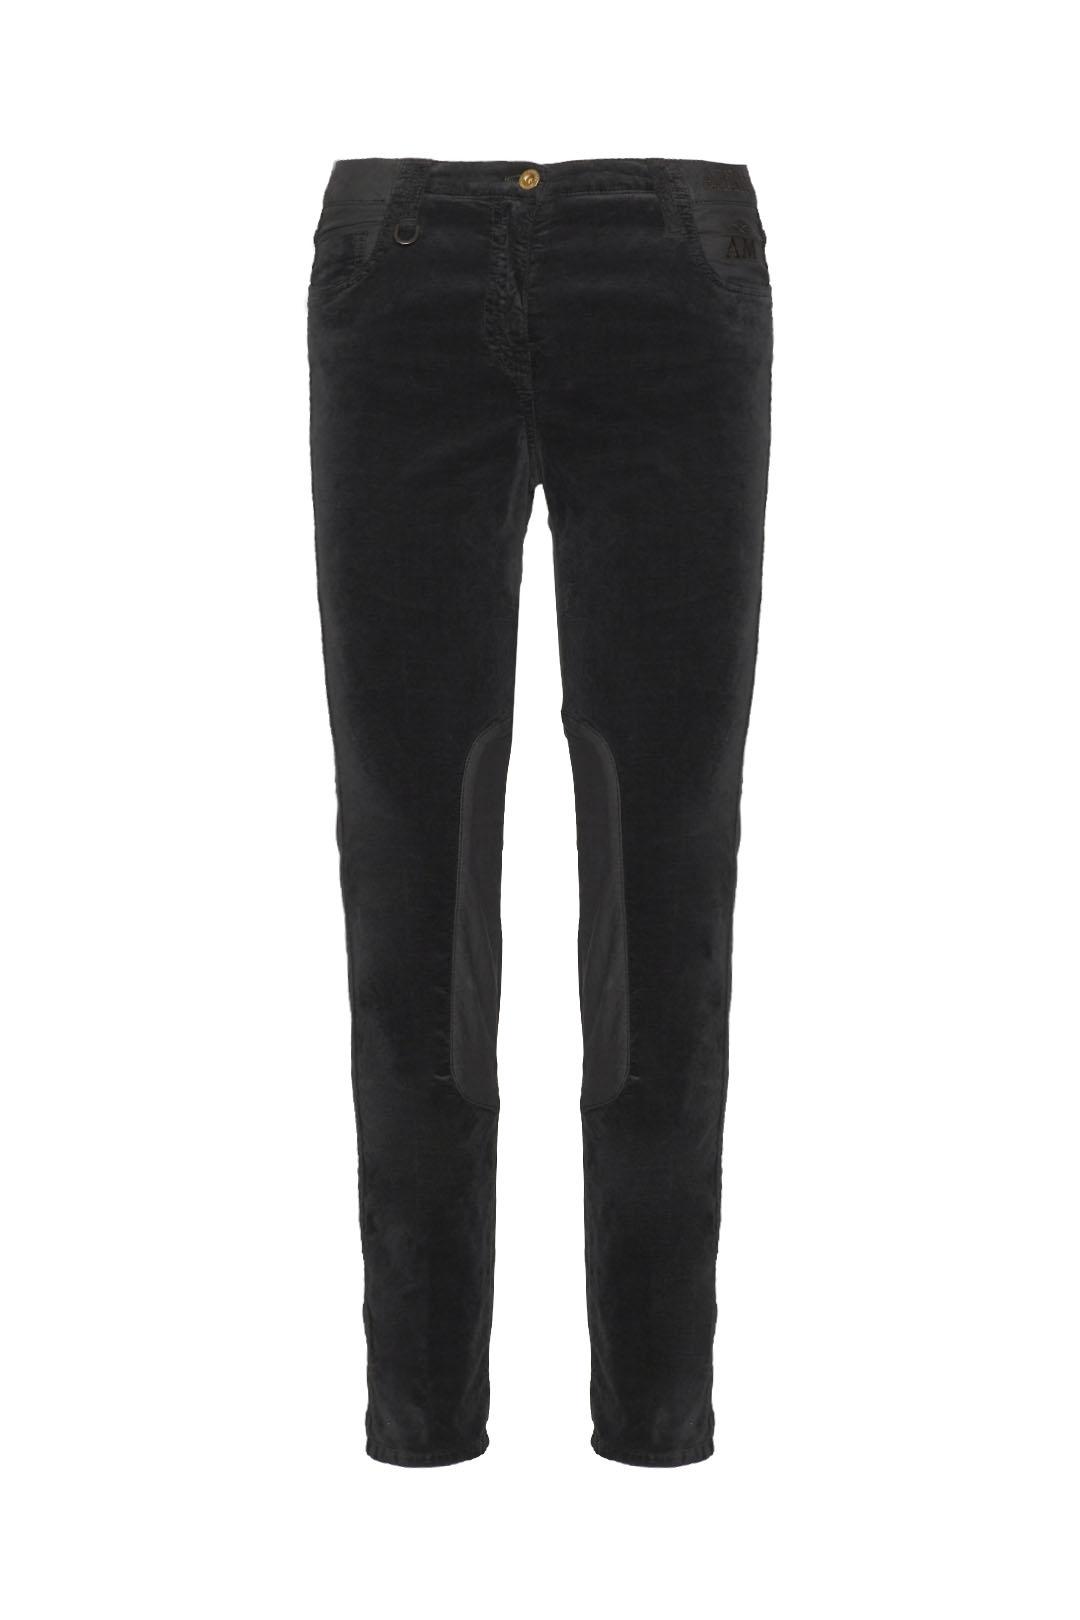 5-pockets velvet trousers with satin     1